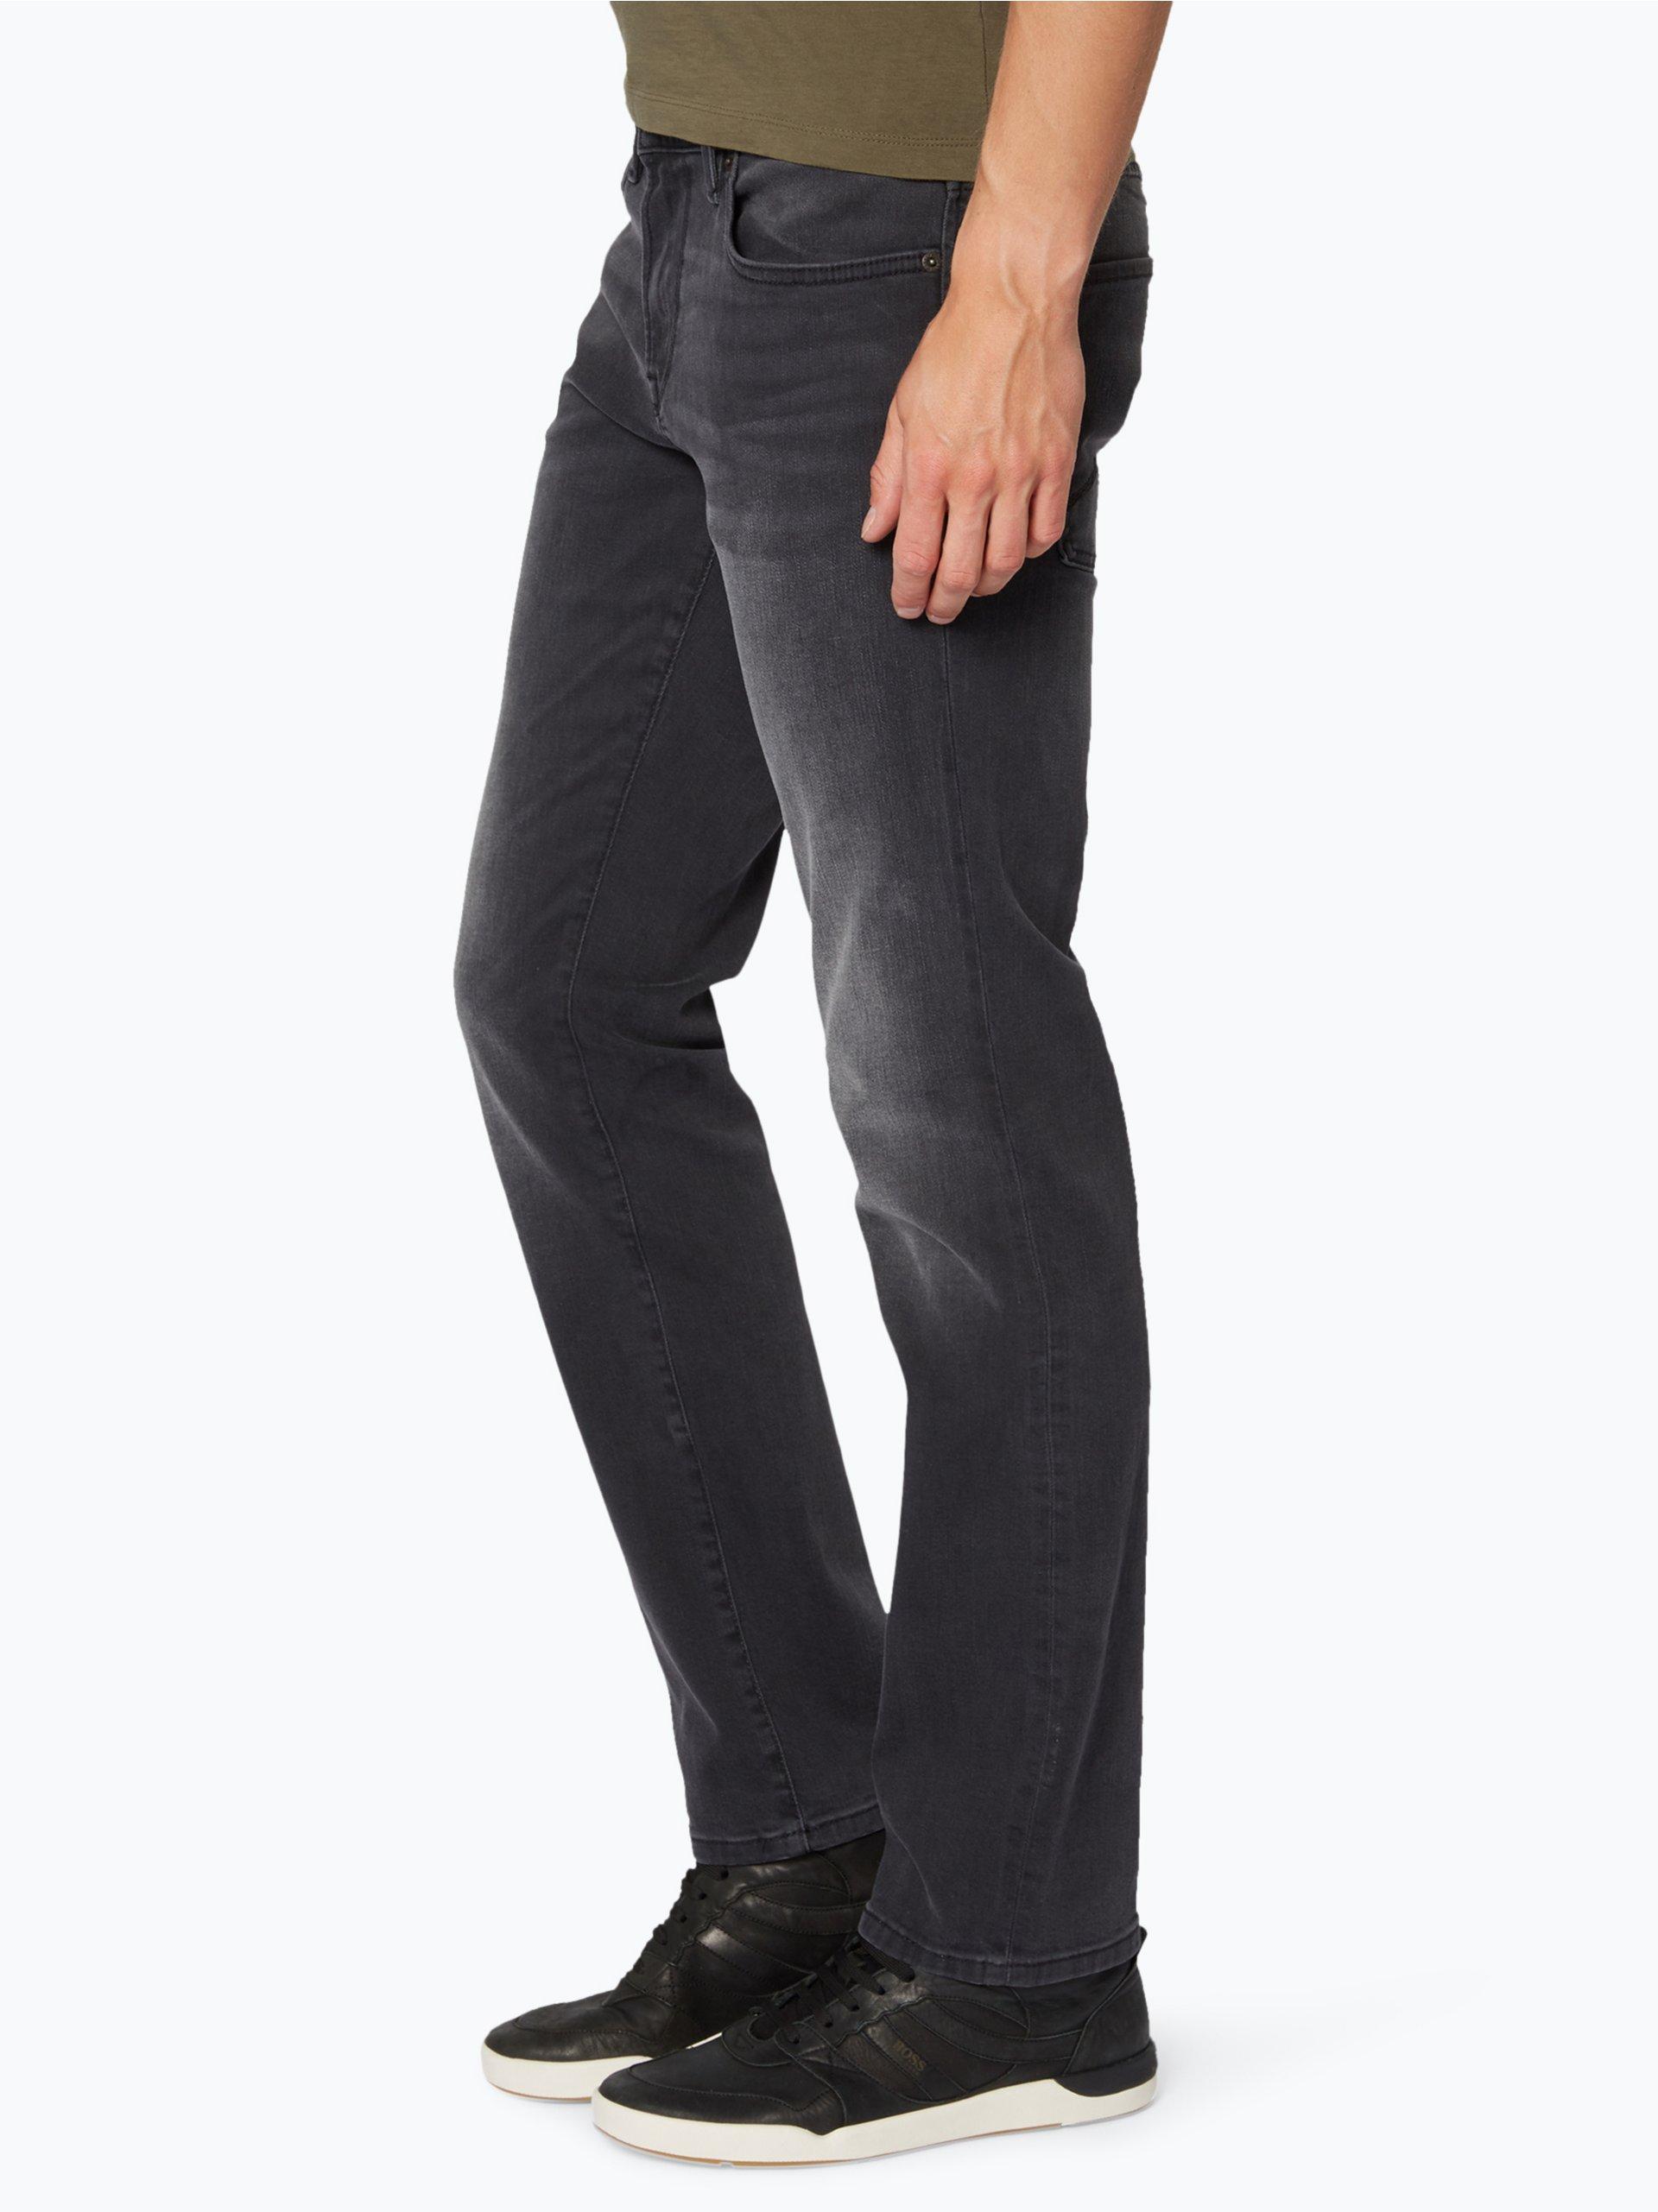 boss casual herren jeans barcelona anthrazit uni online kaufen vangraaf com. Black Bedroom Furniture Sets. Home Design Ideas